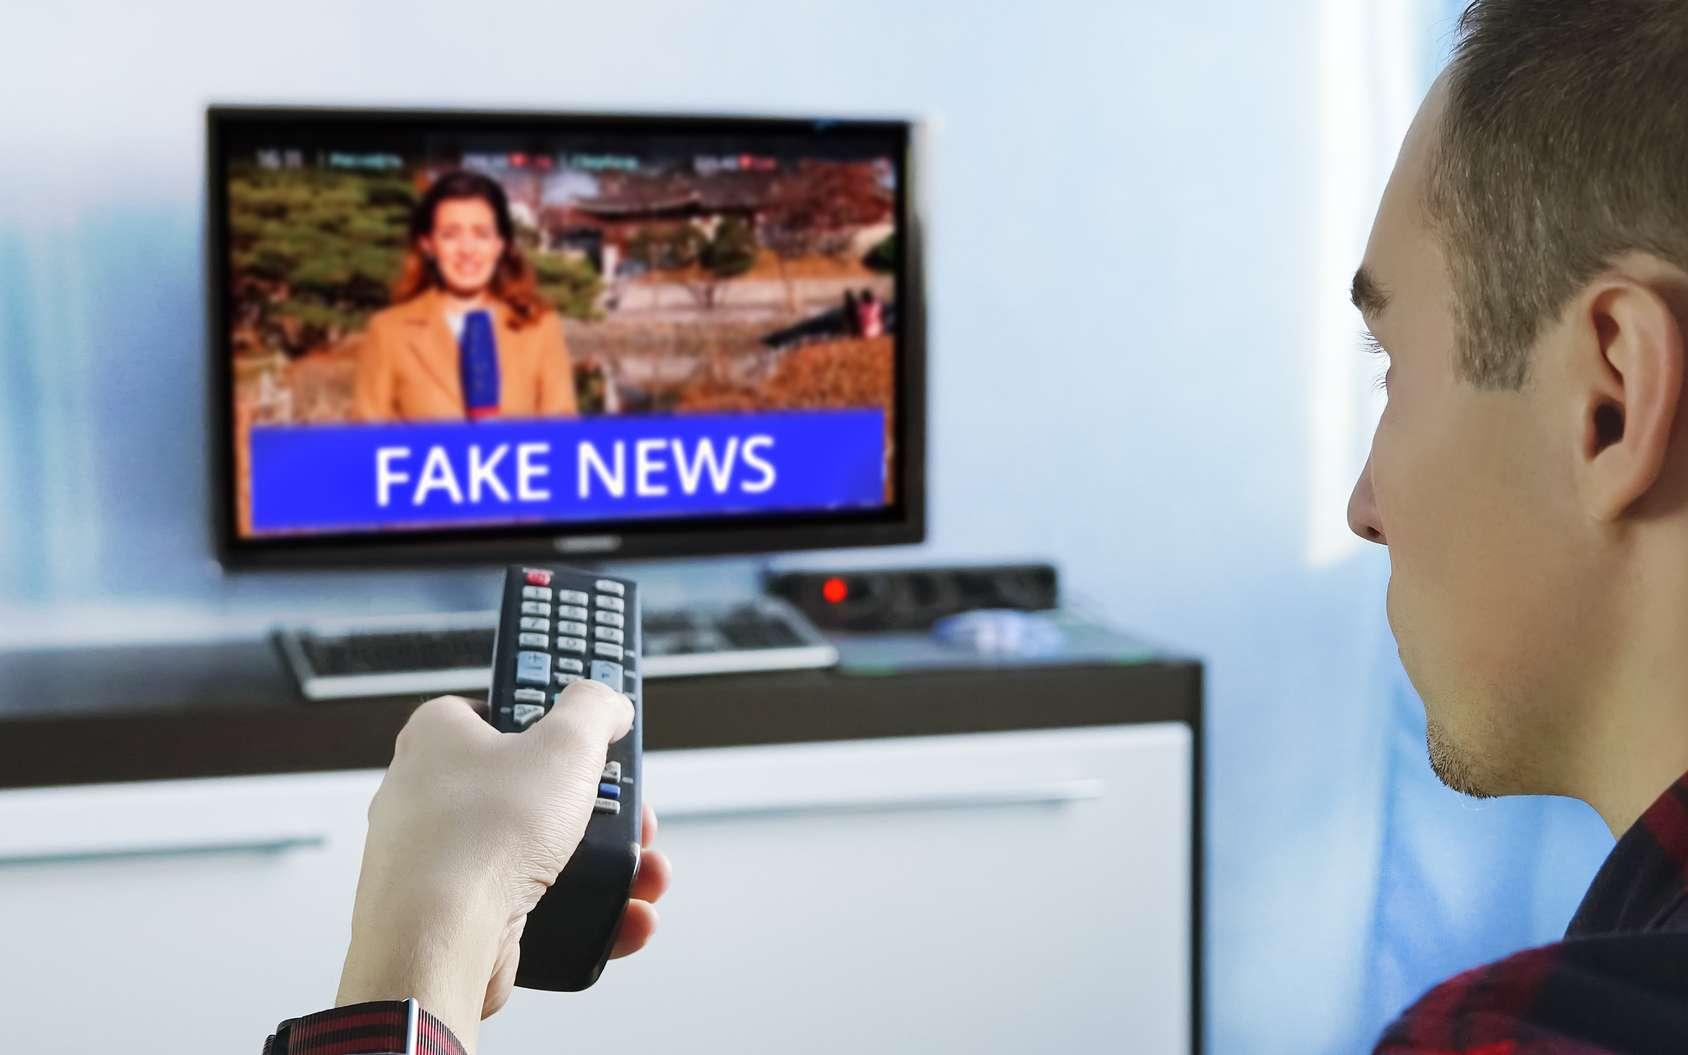 Que sont les fake news ? © diy13, fotolia